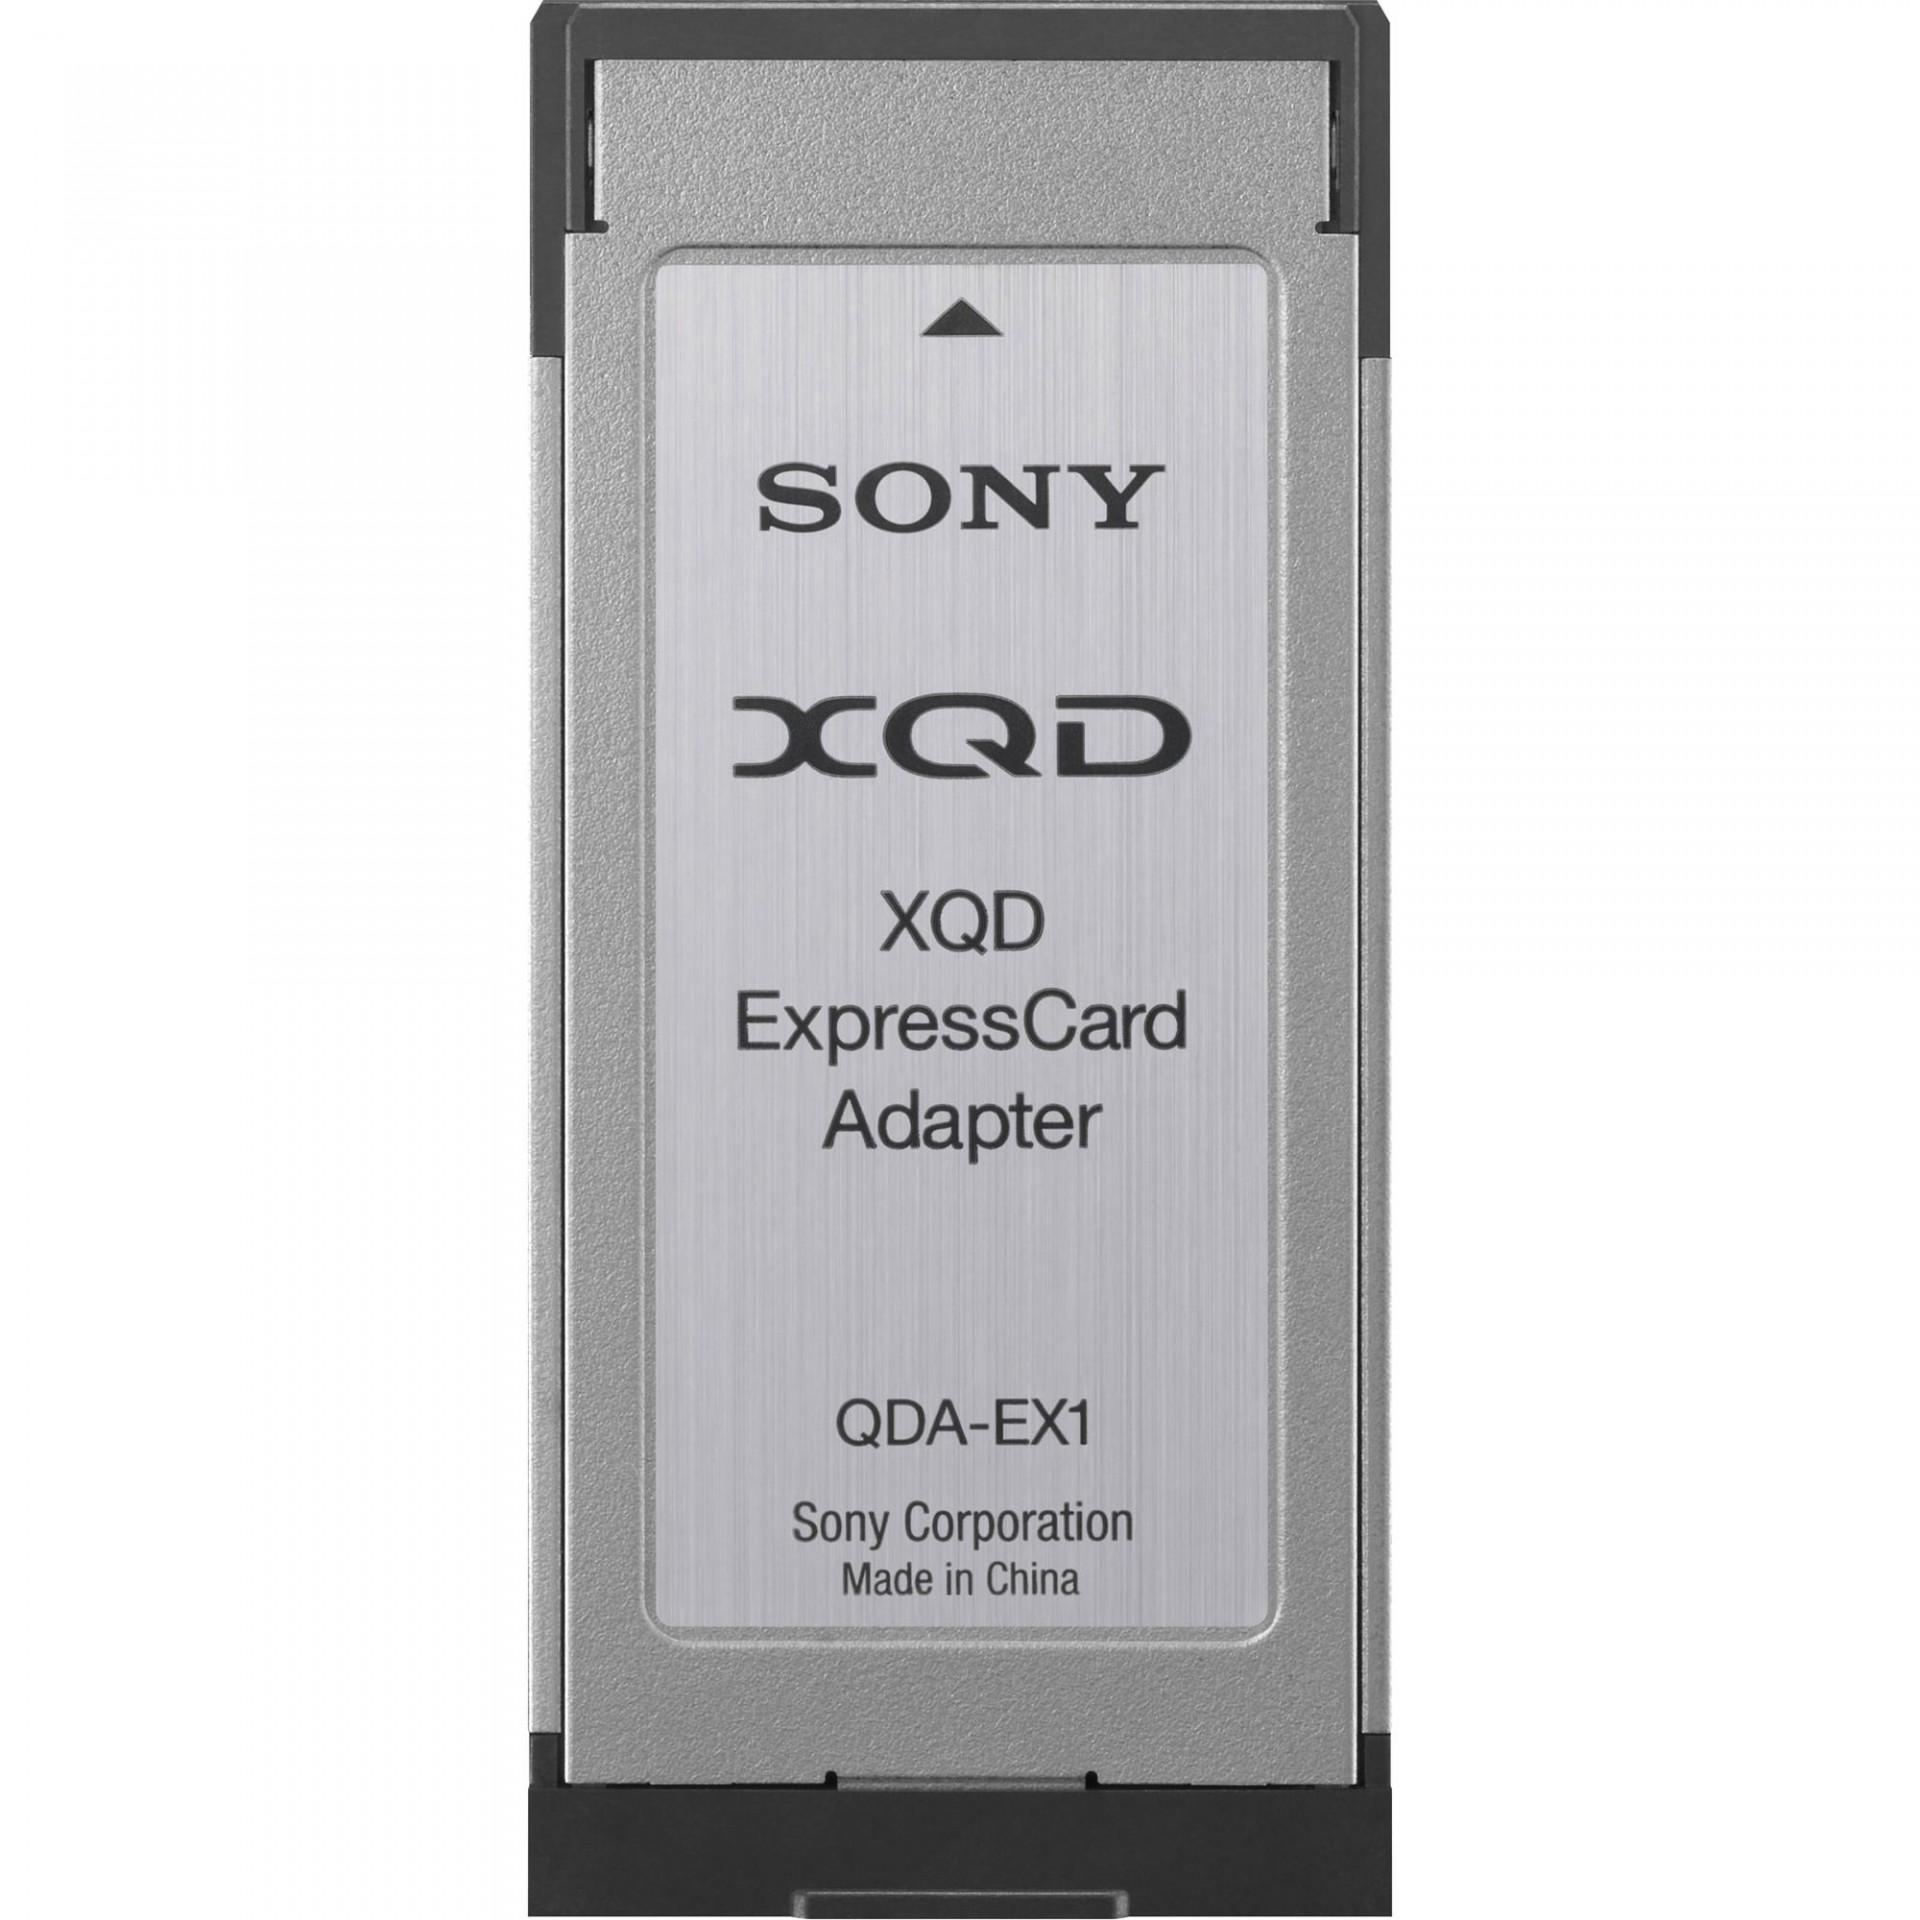 Sony Adaptador QDA-EX1 XQD ExpressCard